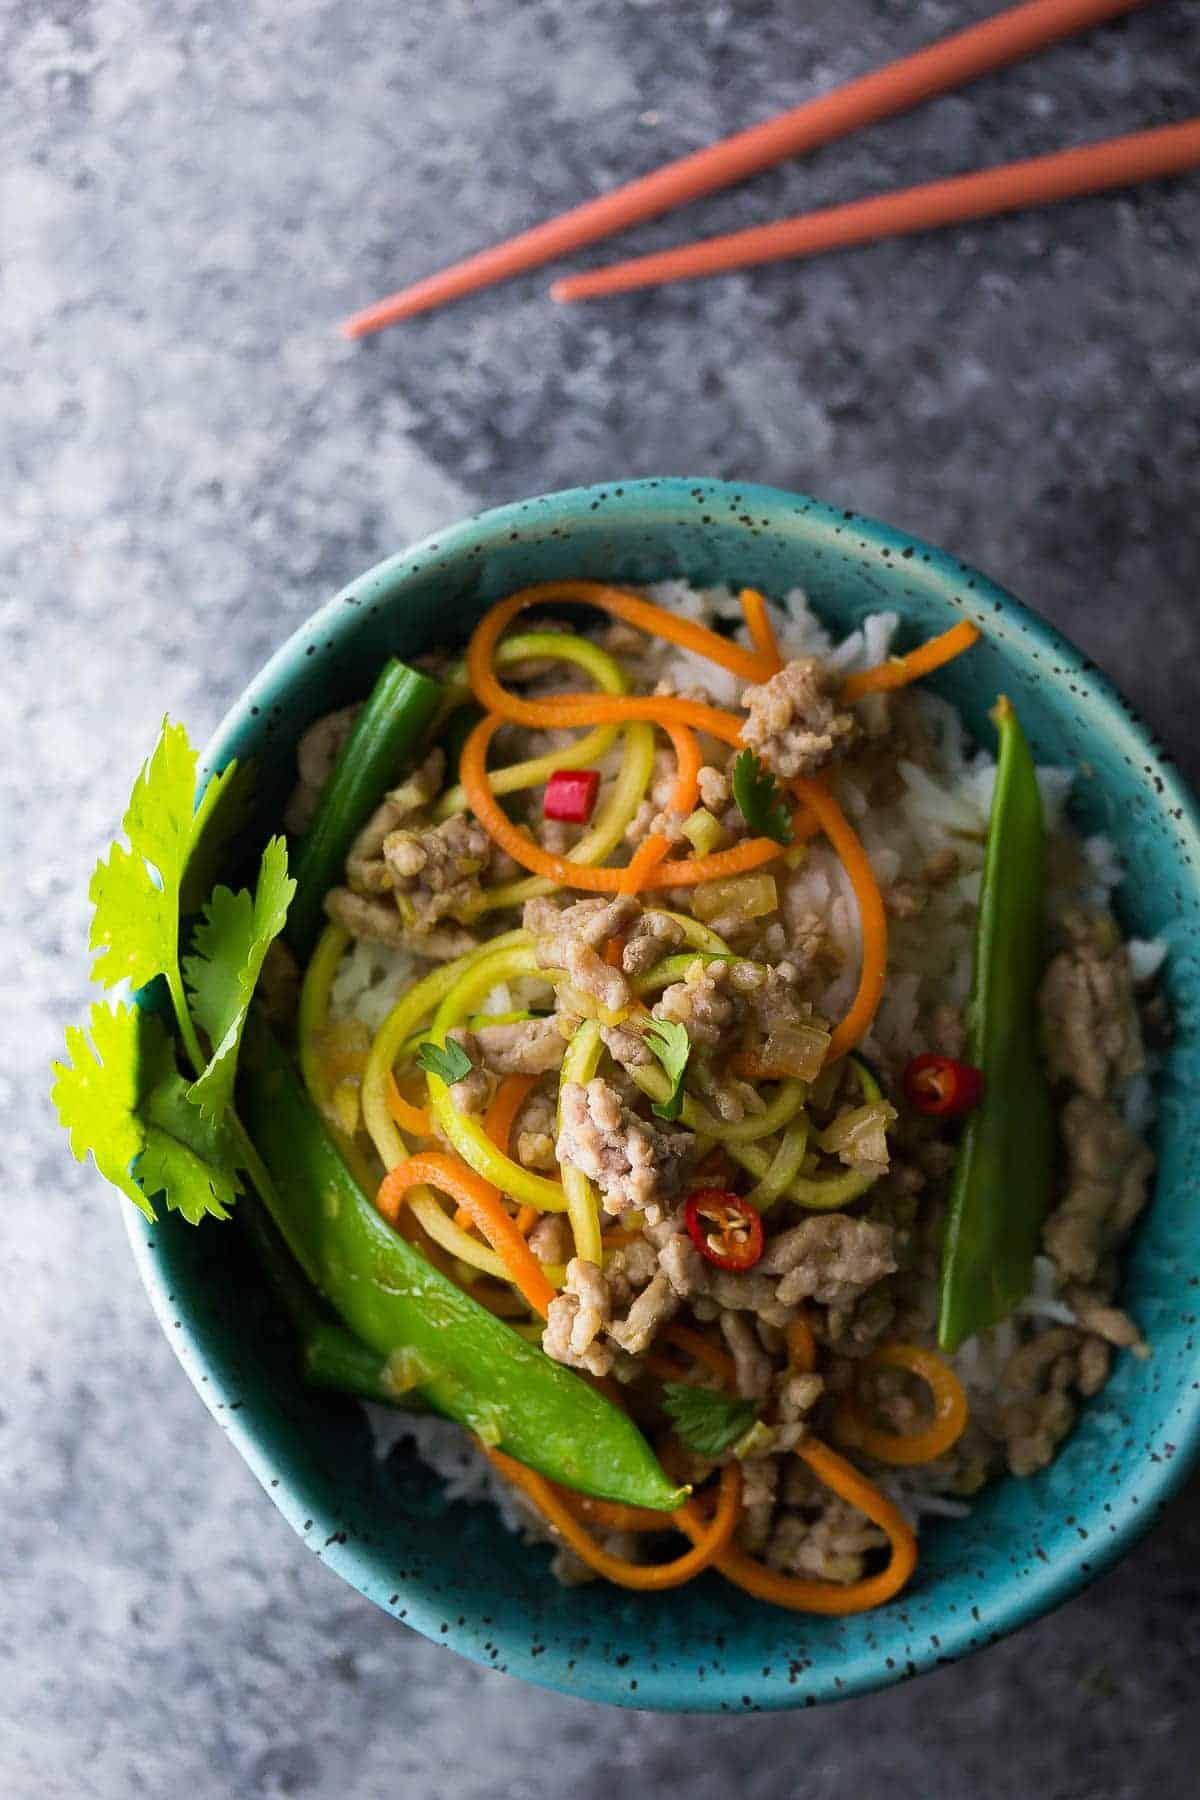 Lemongrass Thai Ground Pork Stir Fry in a blue bowl